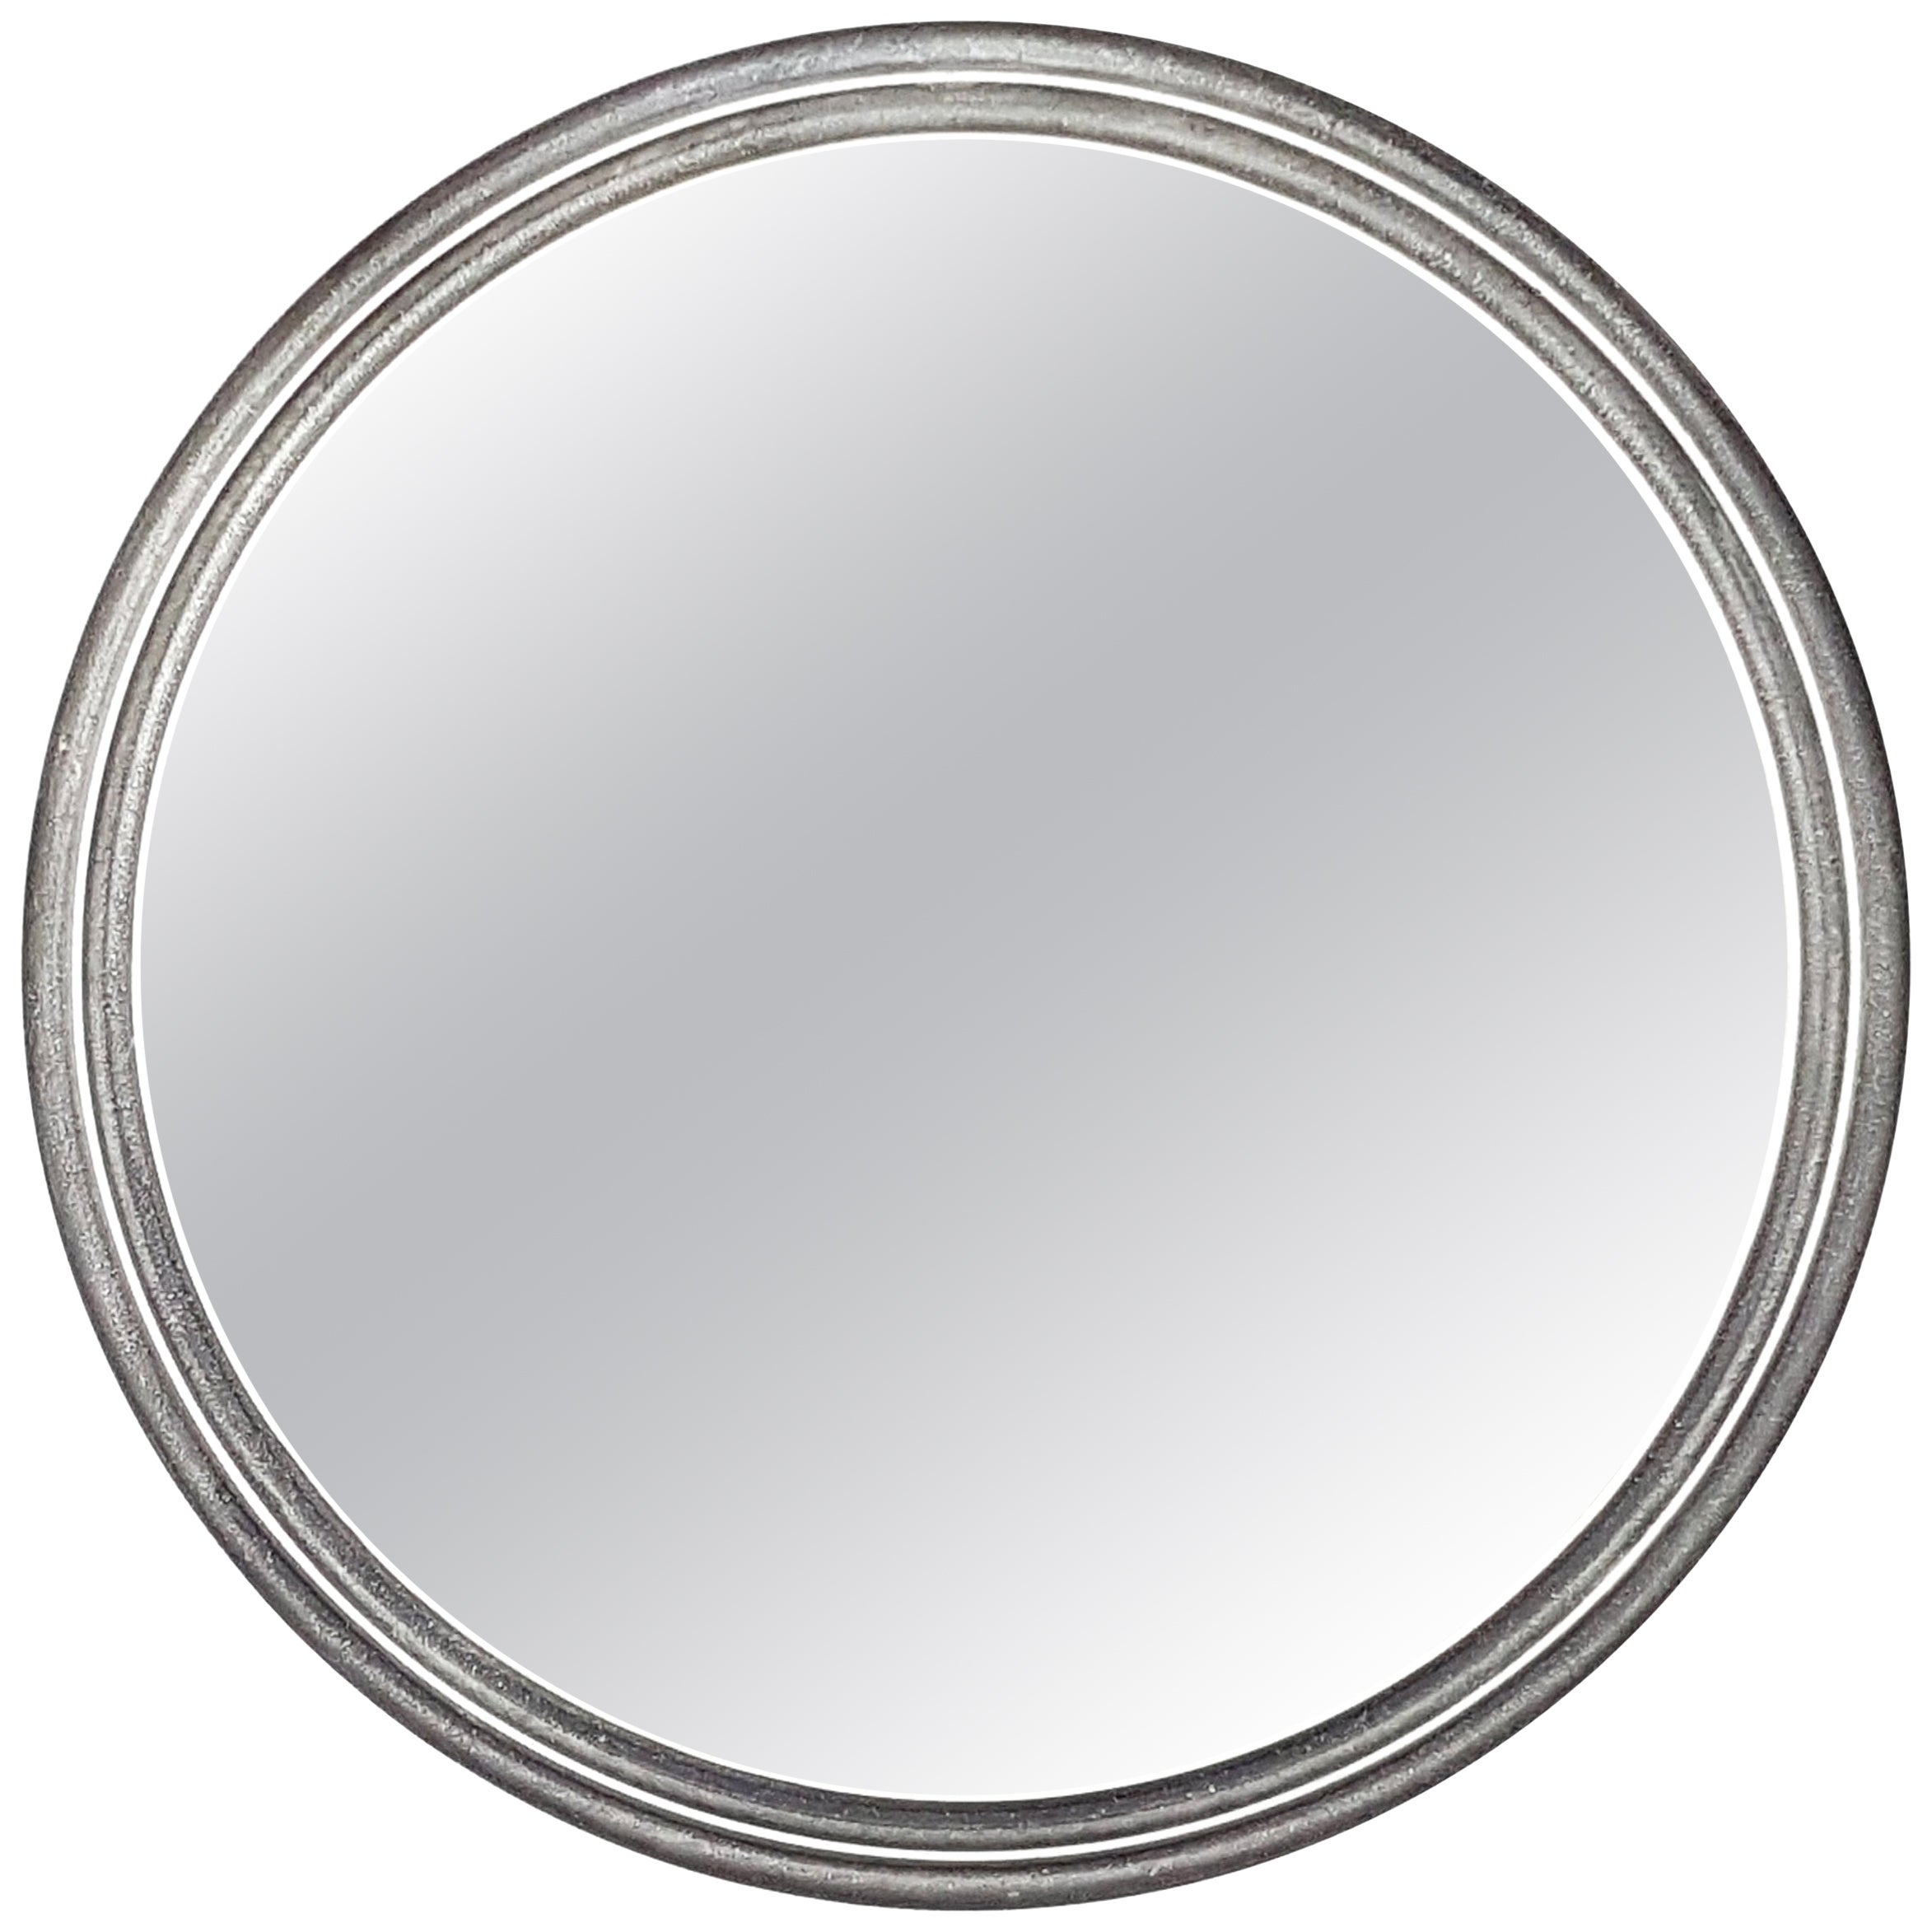 Cast Aluminium Round 1970s Mirror, Lorenzo Burchiellaro for Studio Burchiellaro